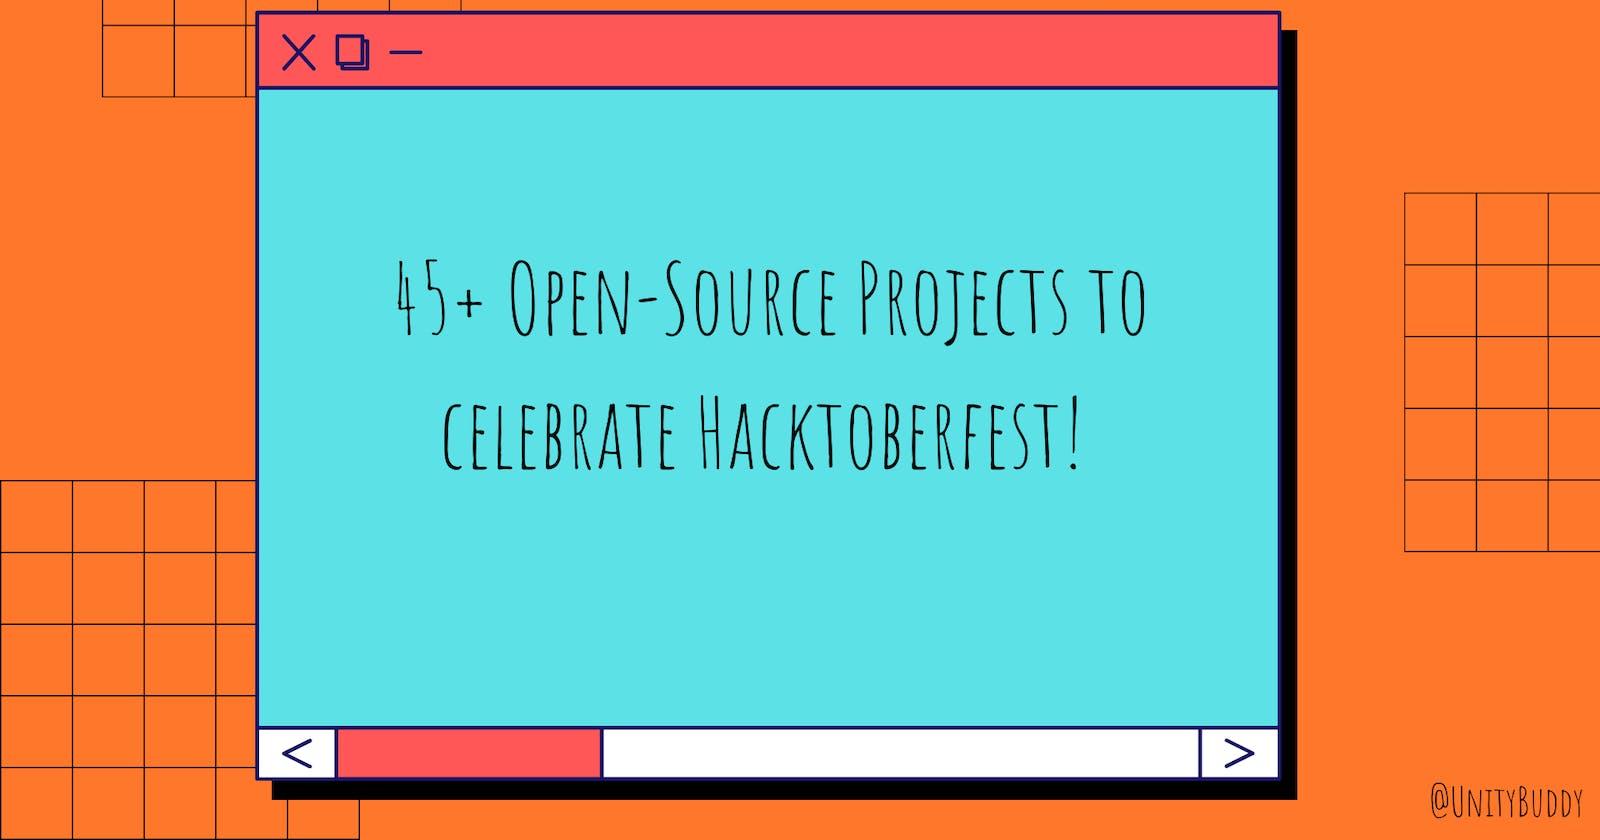 45+ Open-Source Projects to celebrate Hacktoberfest! 🎉